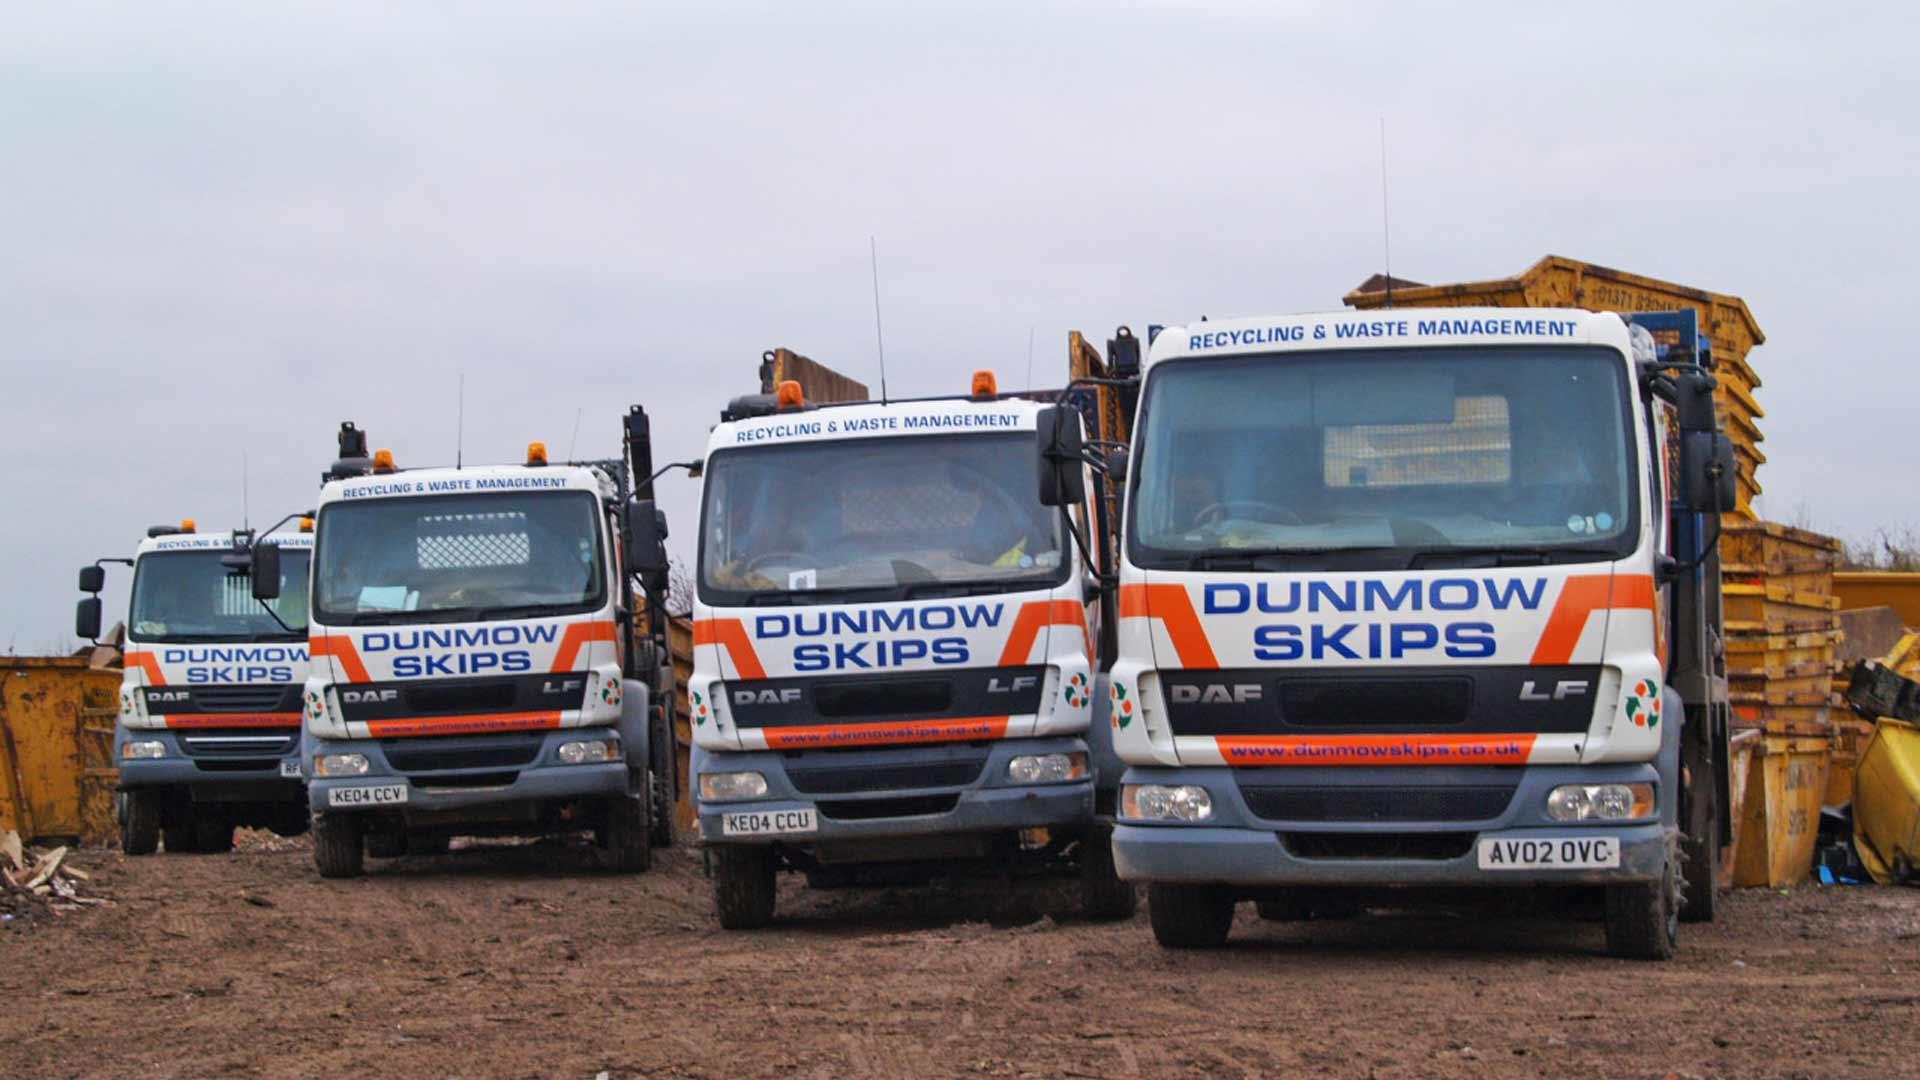 32-Dunmow-Skip-Hire-History